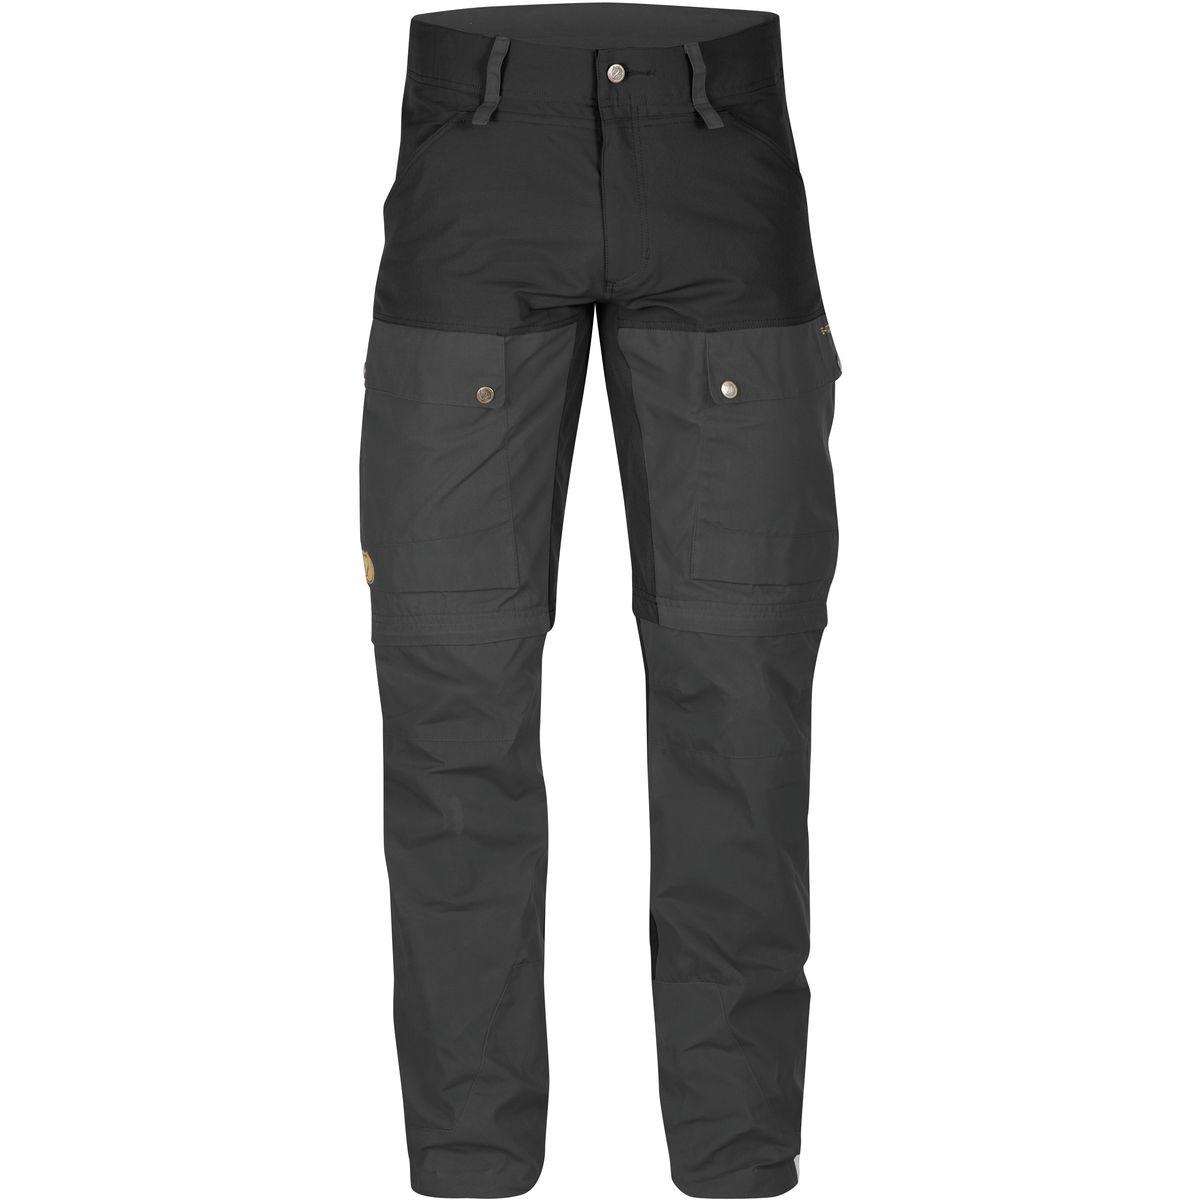 Fjallraven Keb Gaiter Trousers